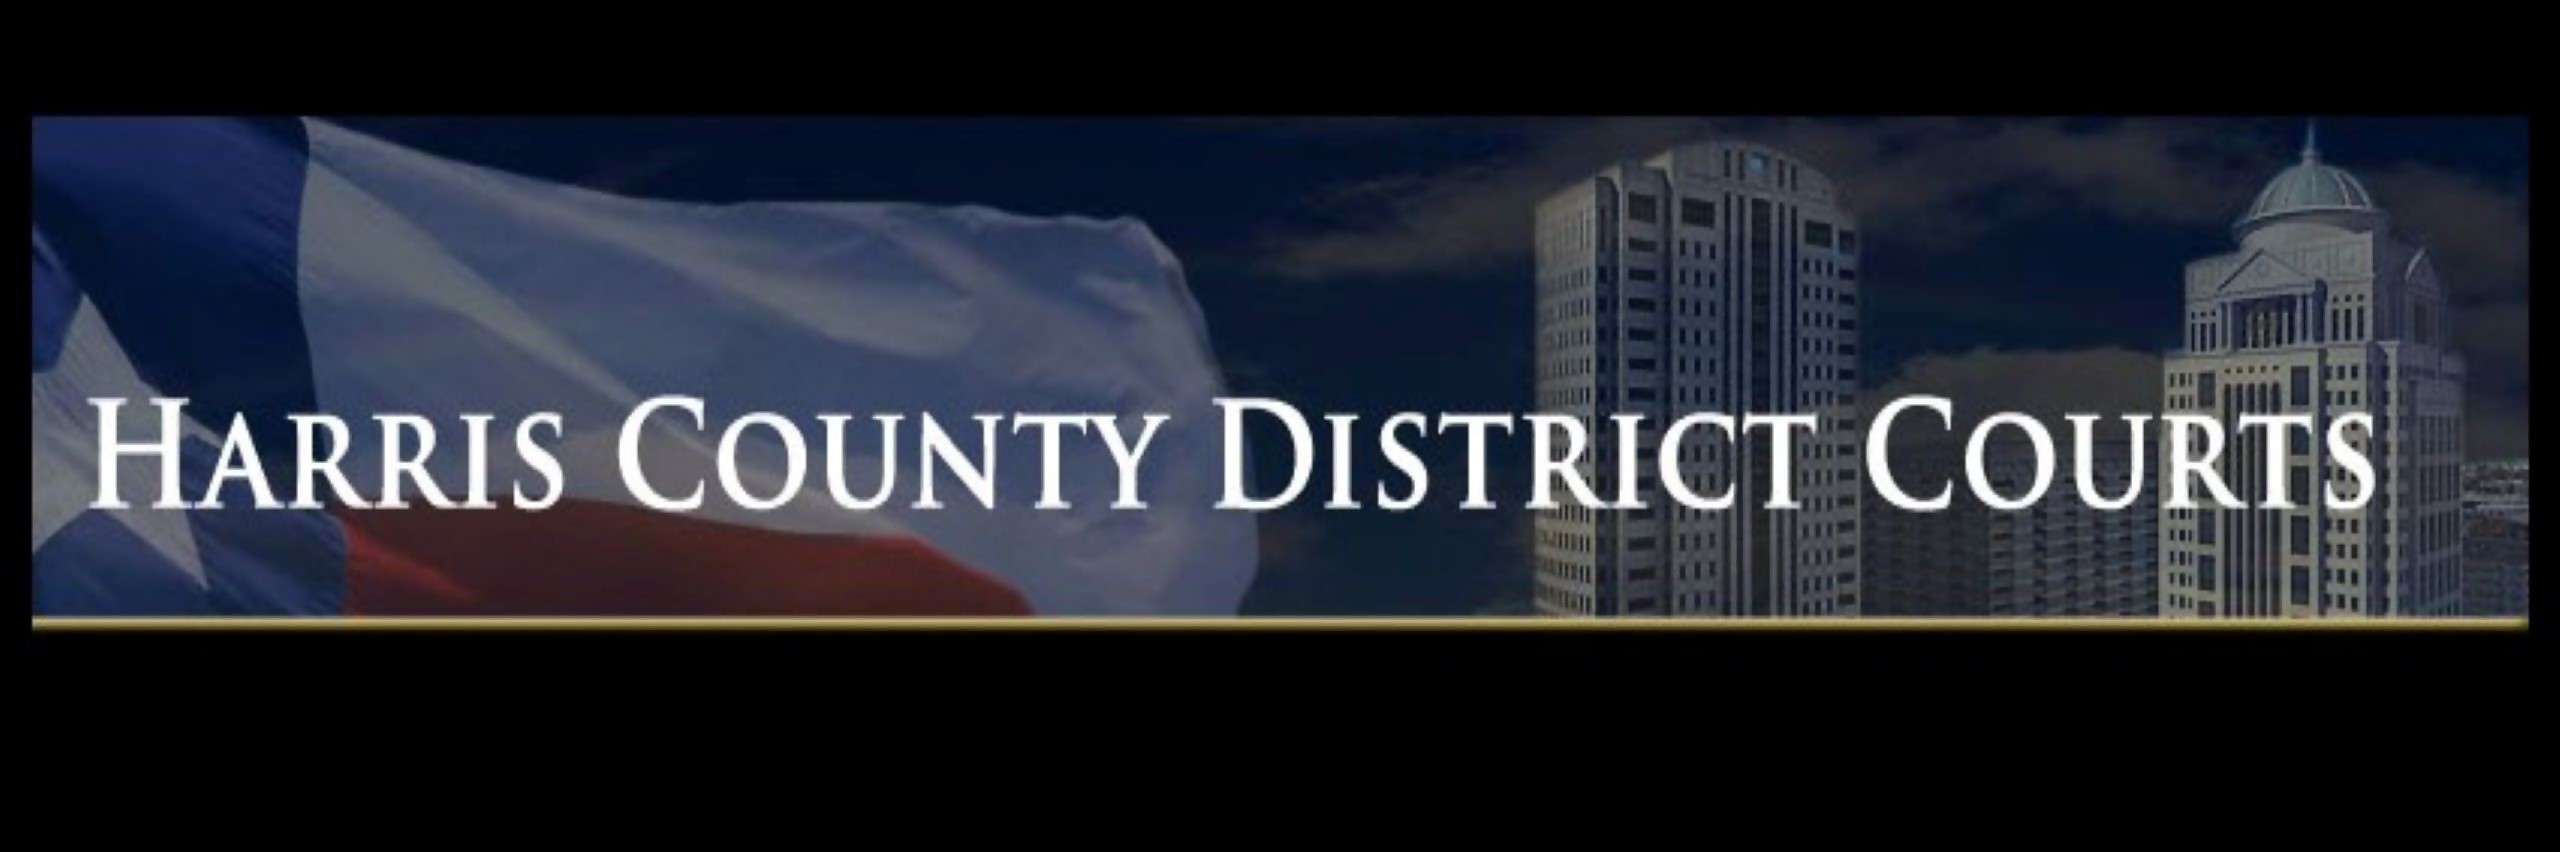 295th District Court - Live Stream